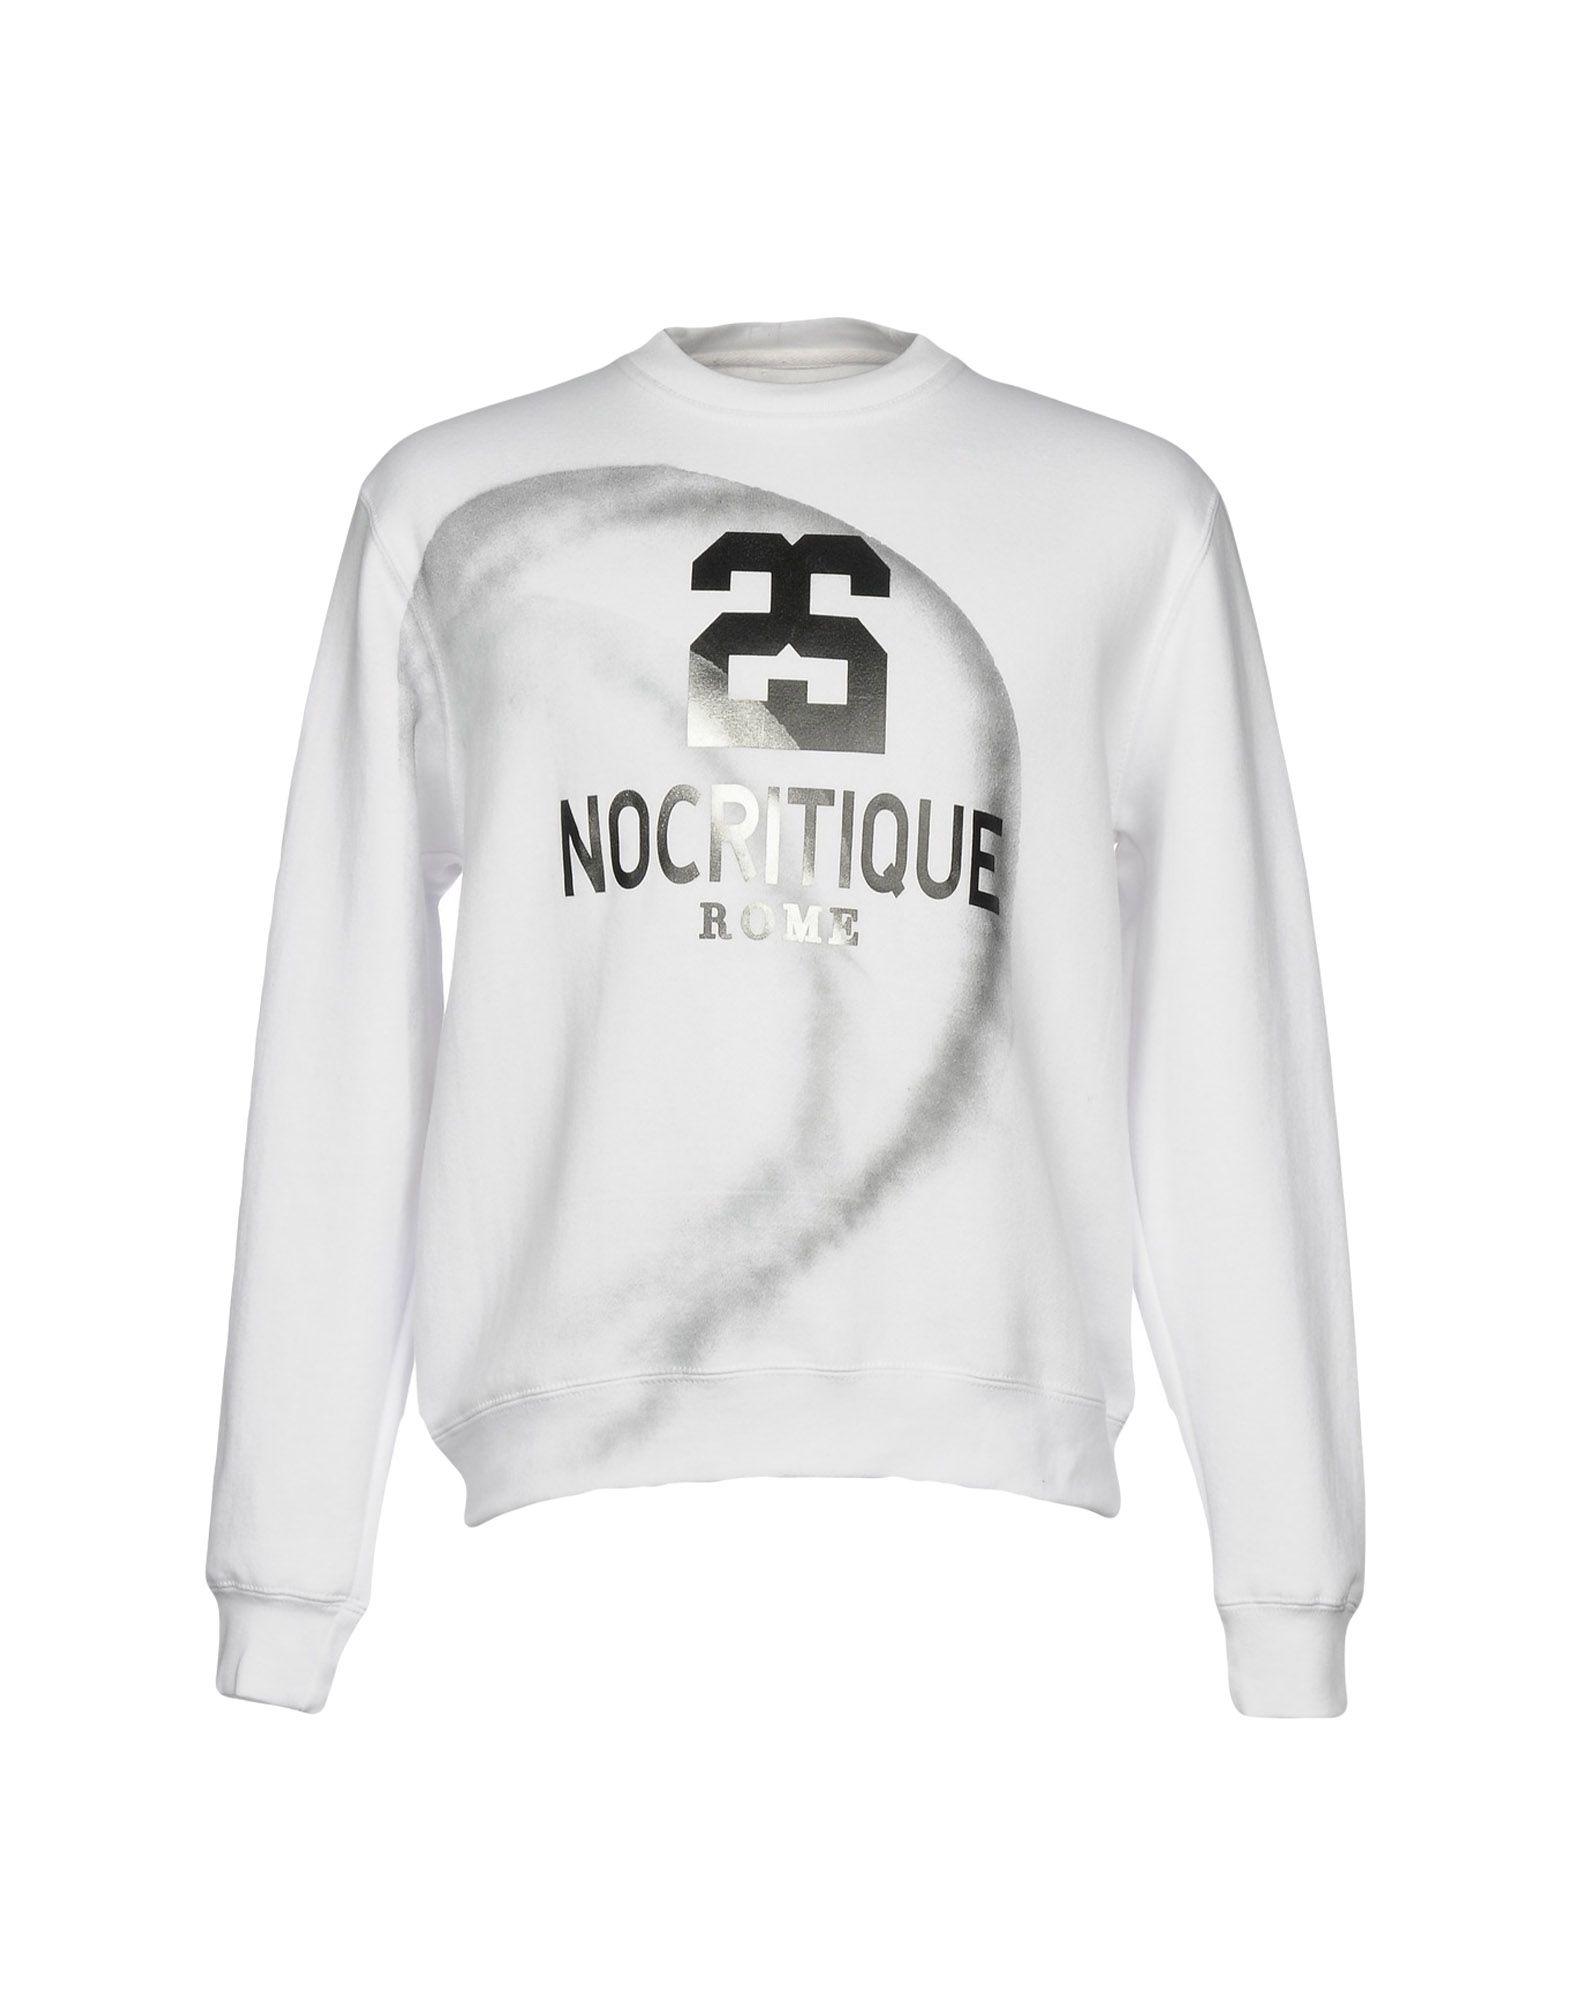 NO CRITIQUE Rome Sweatshirts